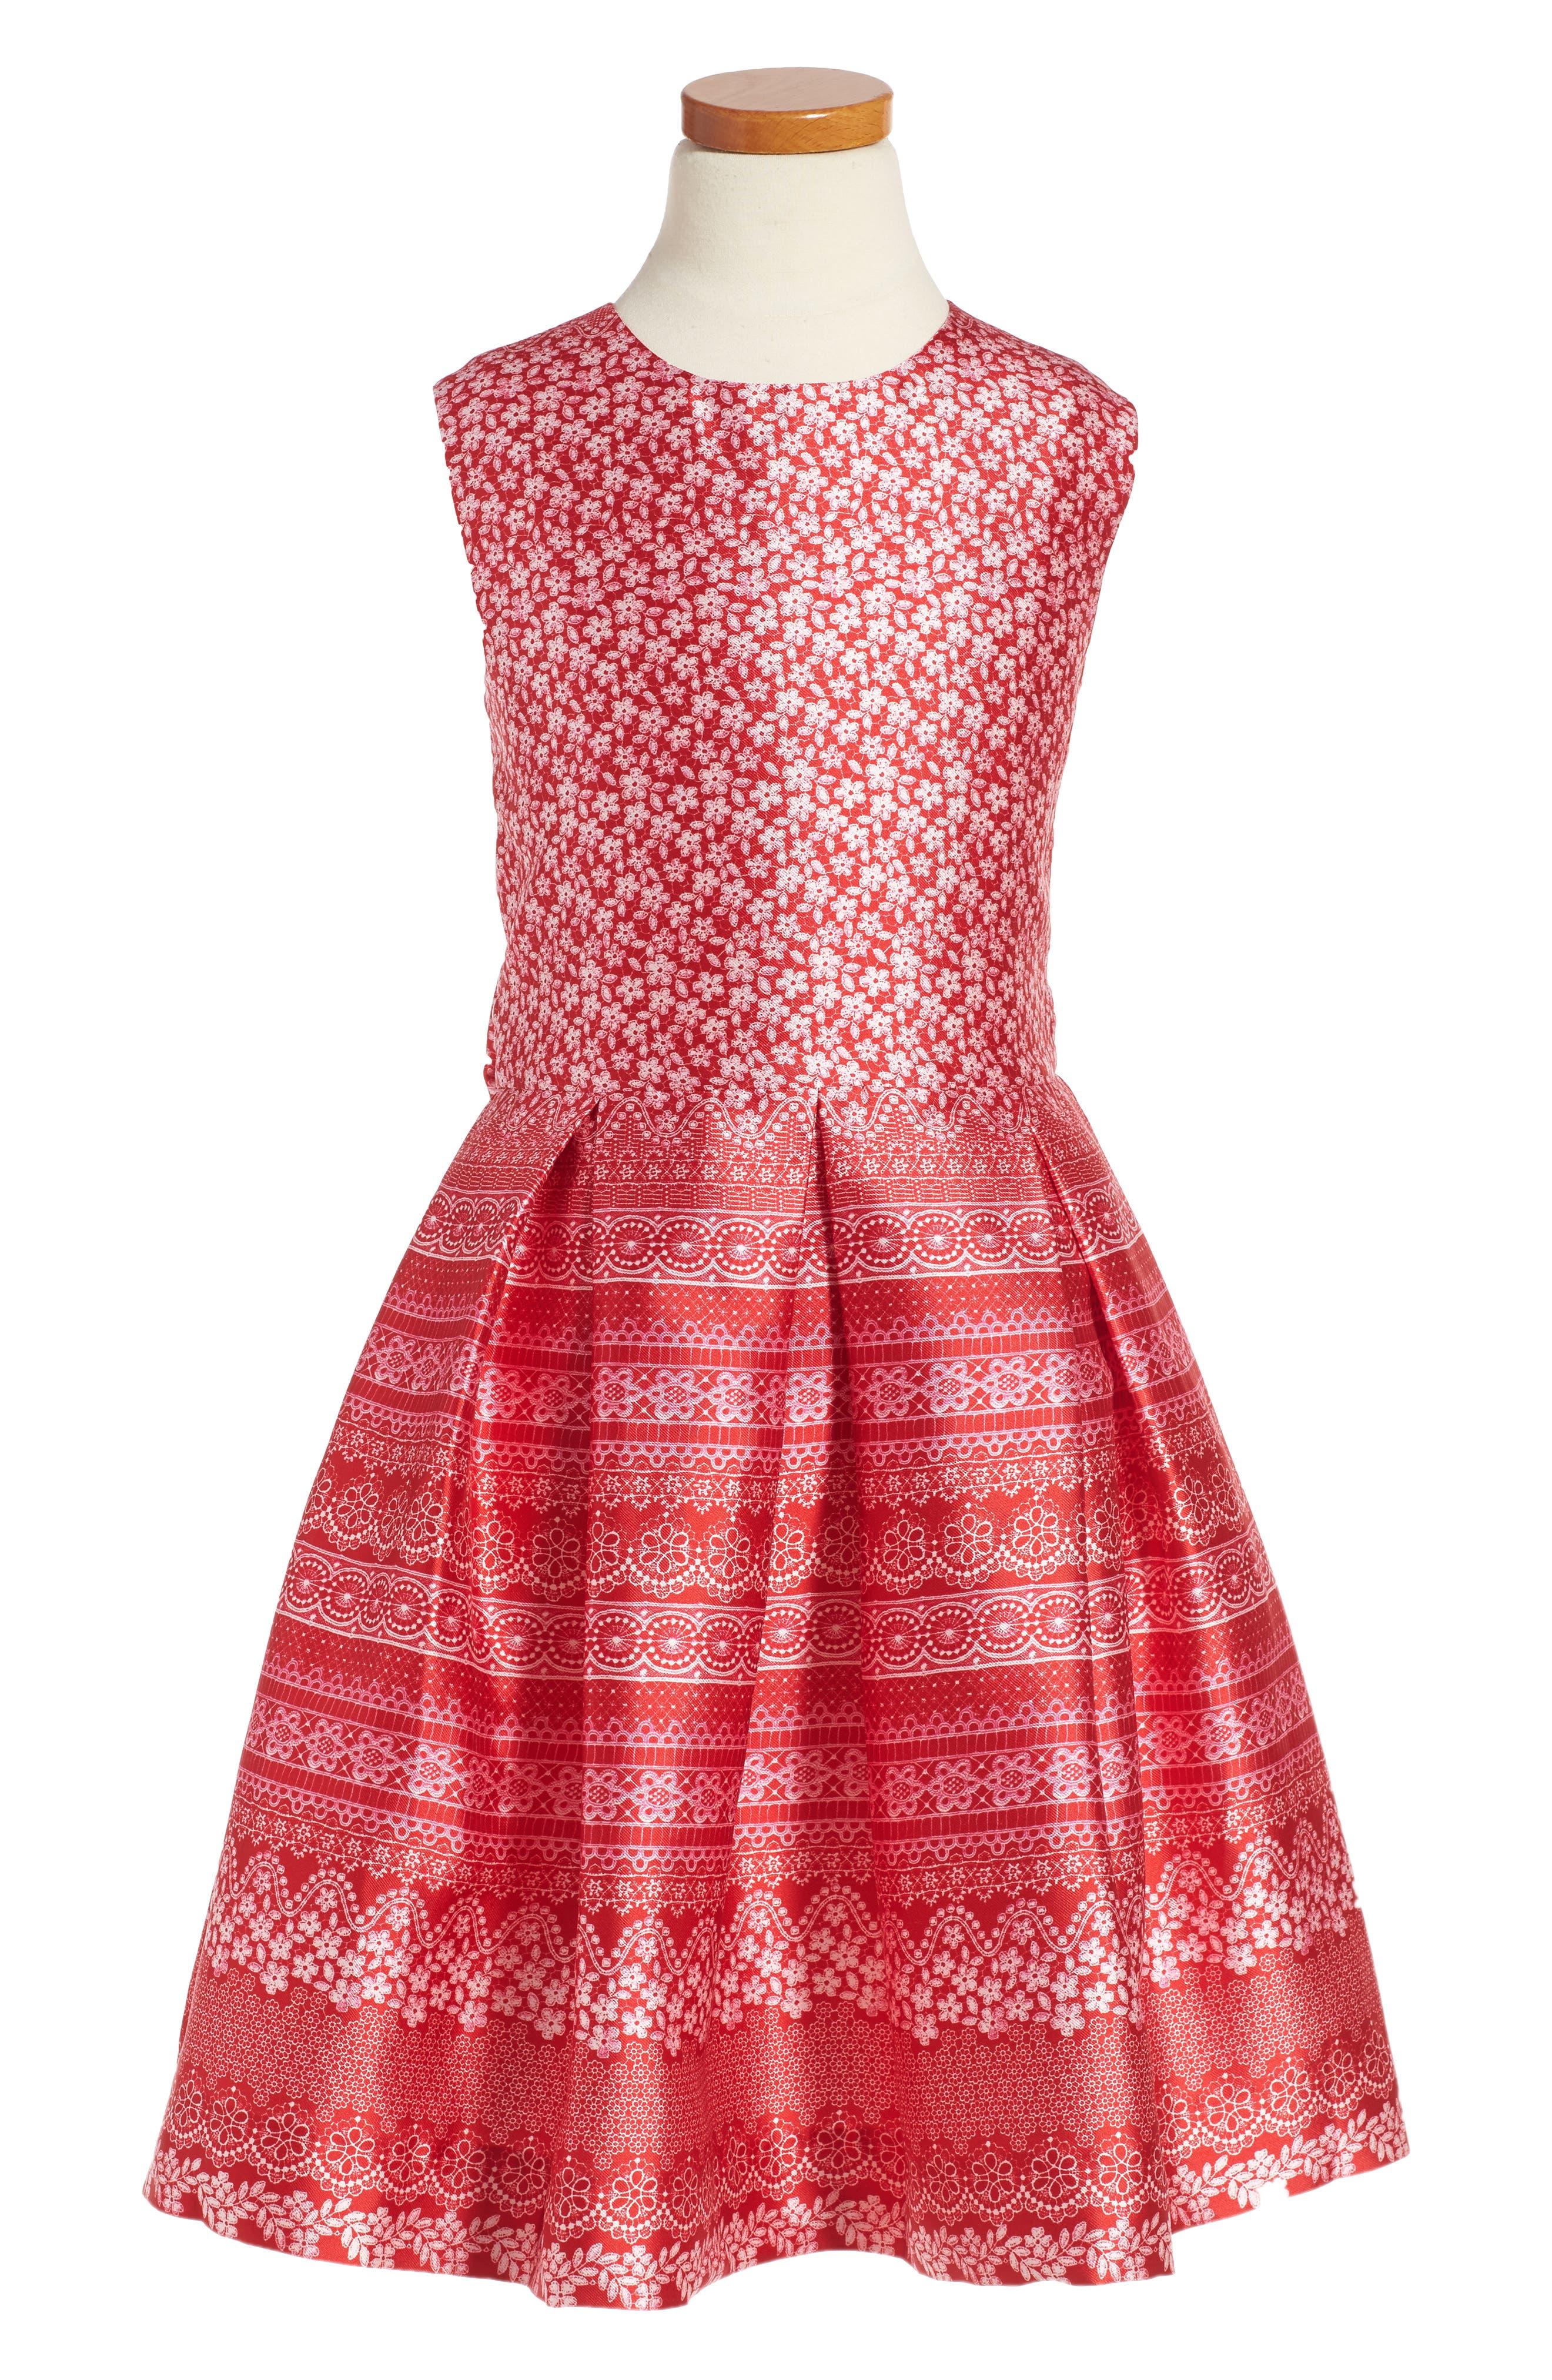 Oscar de la Renta Lace Bands Mikado Party Dress (Big Girls)